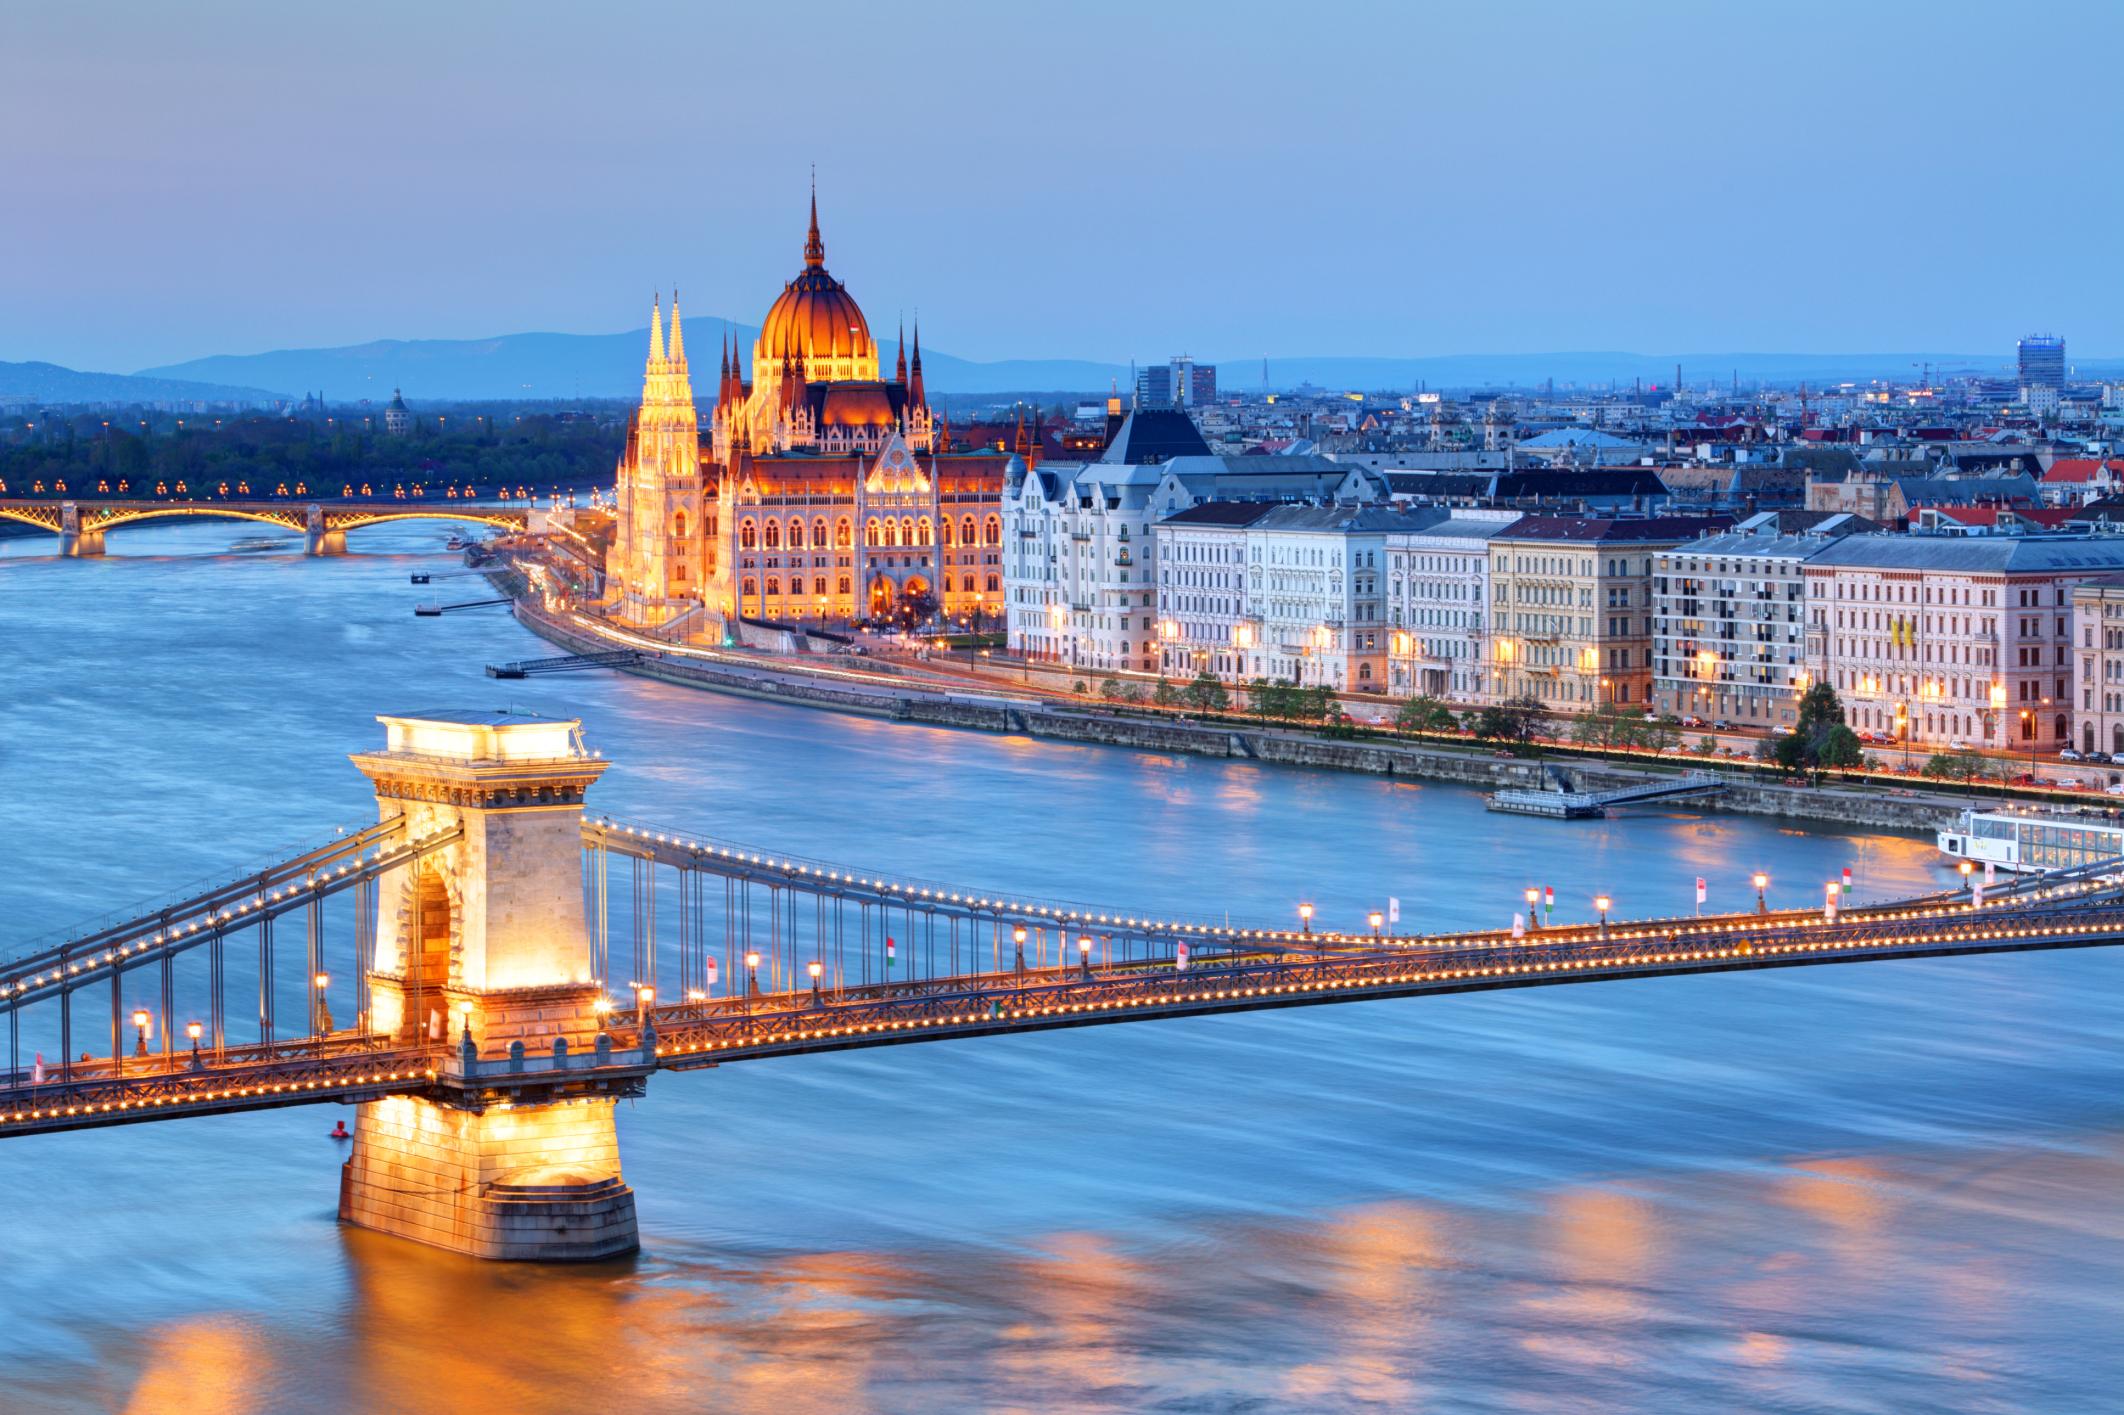 Budapest lit up at dusk